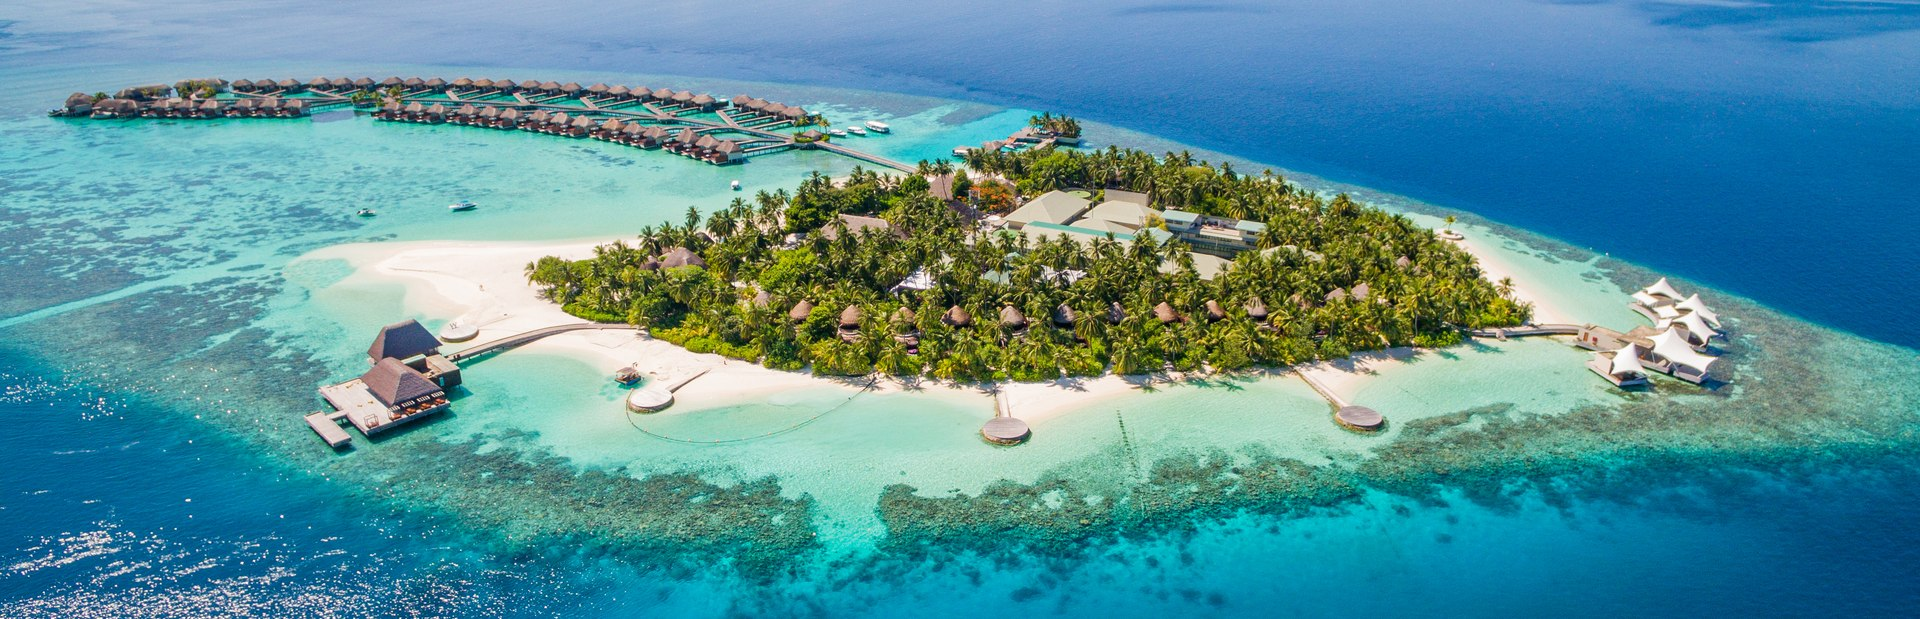 Maldives charter itineraries